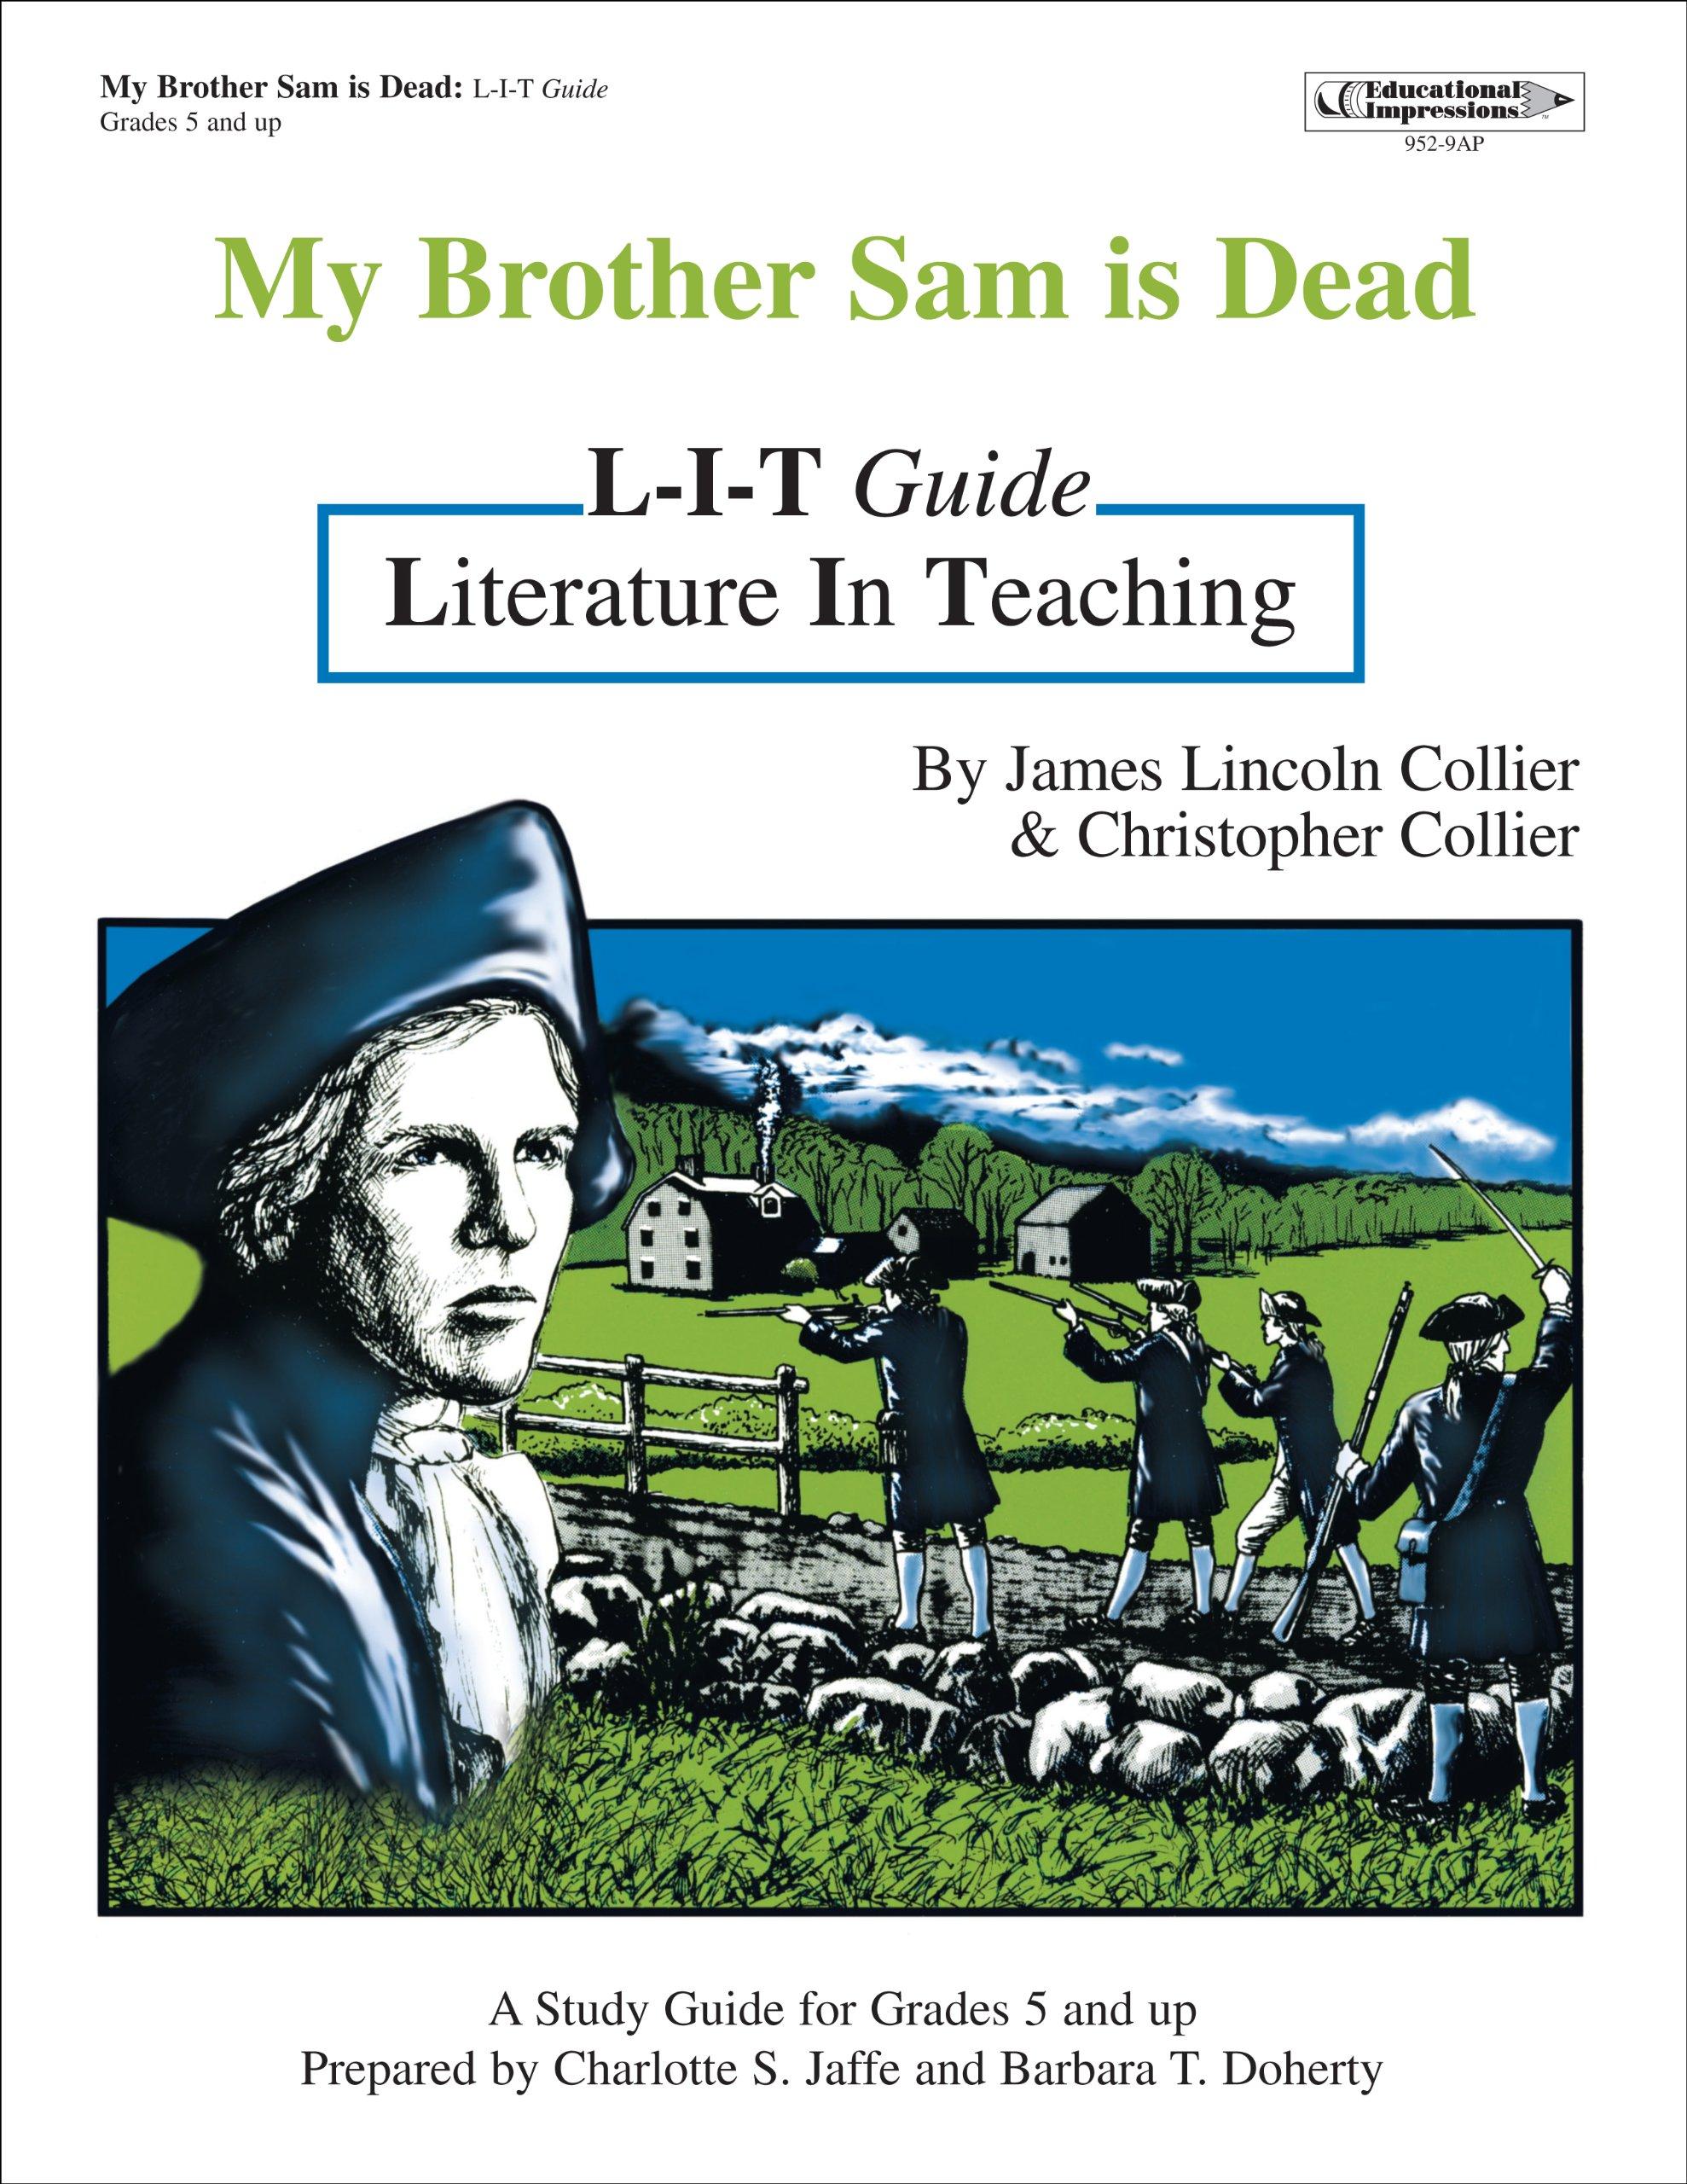 MY BROTHER SAM IS DEAD: Charlotte Jaffe, Barbara Doherty: 9781566449526:  Amazon.com: Books